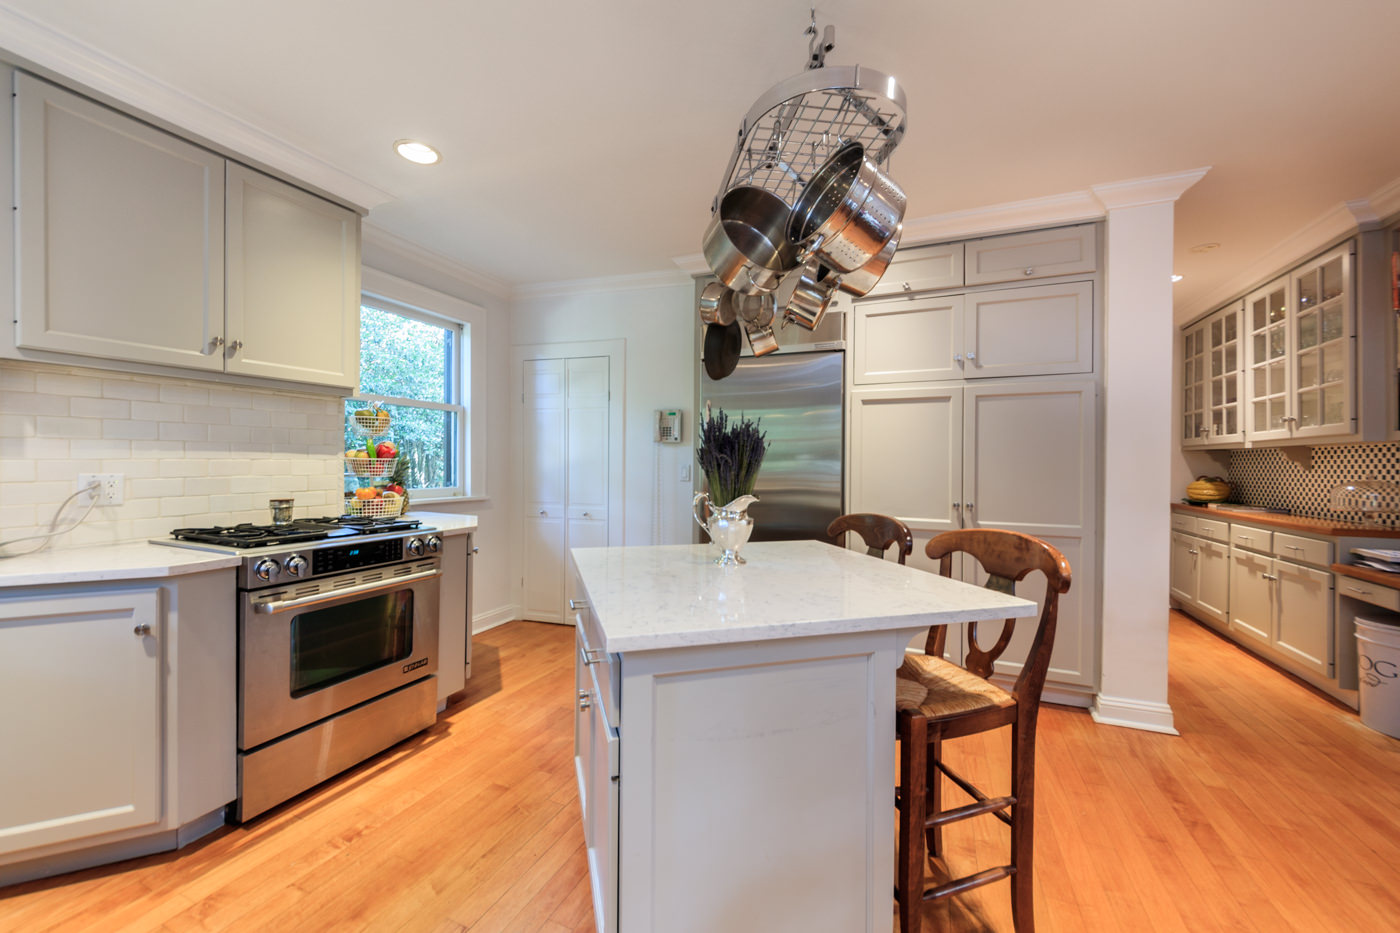 Kitchen cabinets summit nj - 141 Oak Ridge Ave Summit Nj 07901